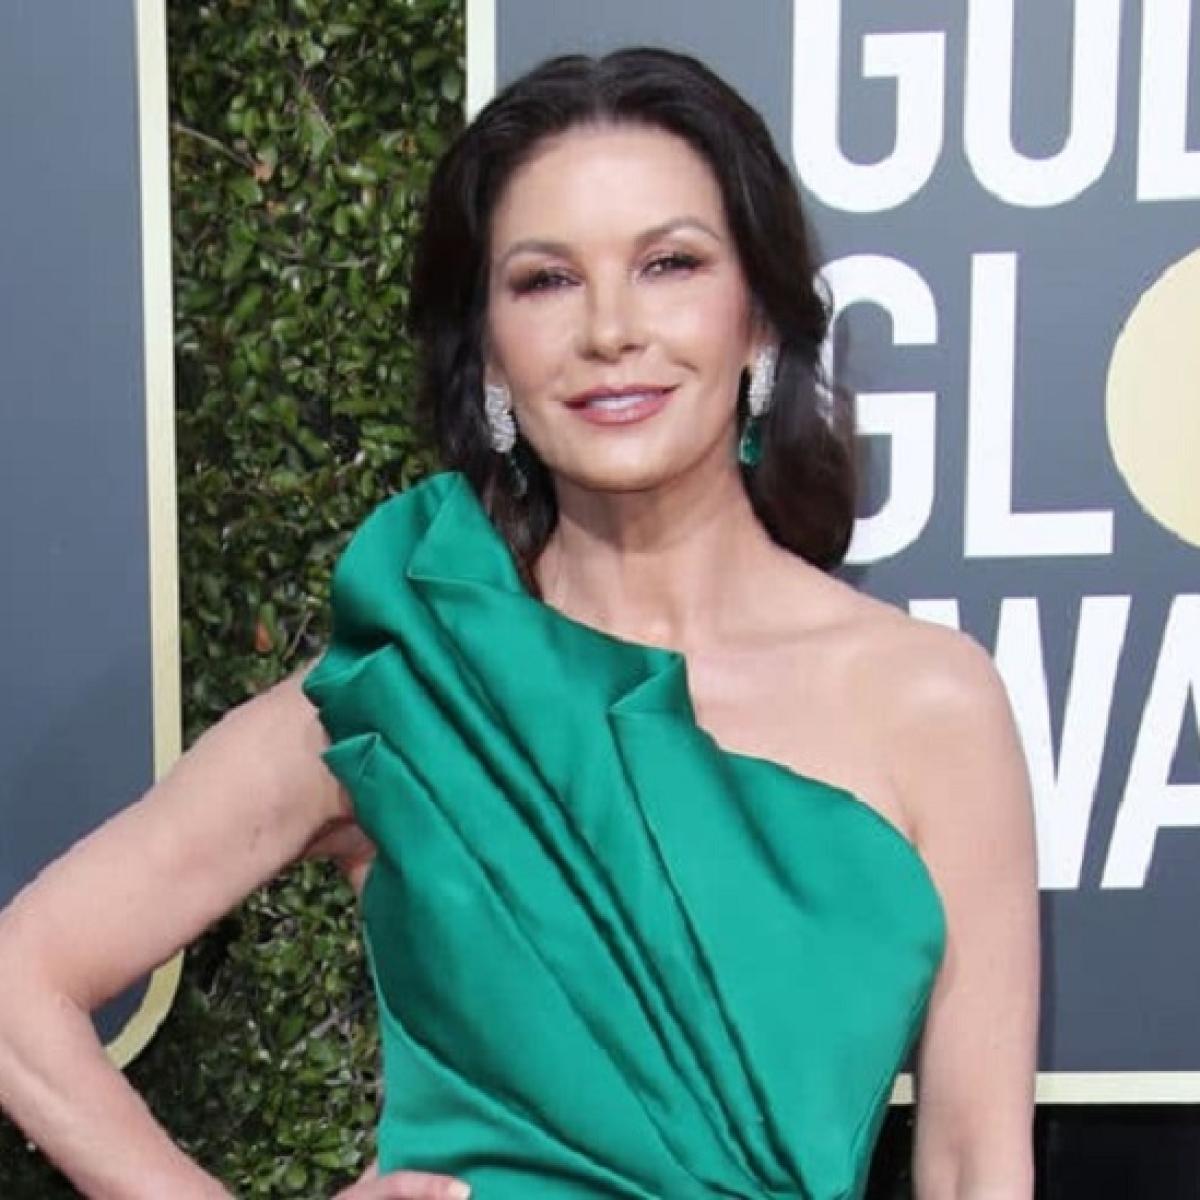 Catherine Zeta Jones roped in for the second season of 'Prodigal Son'